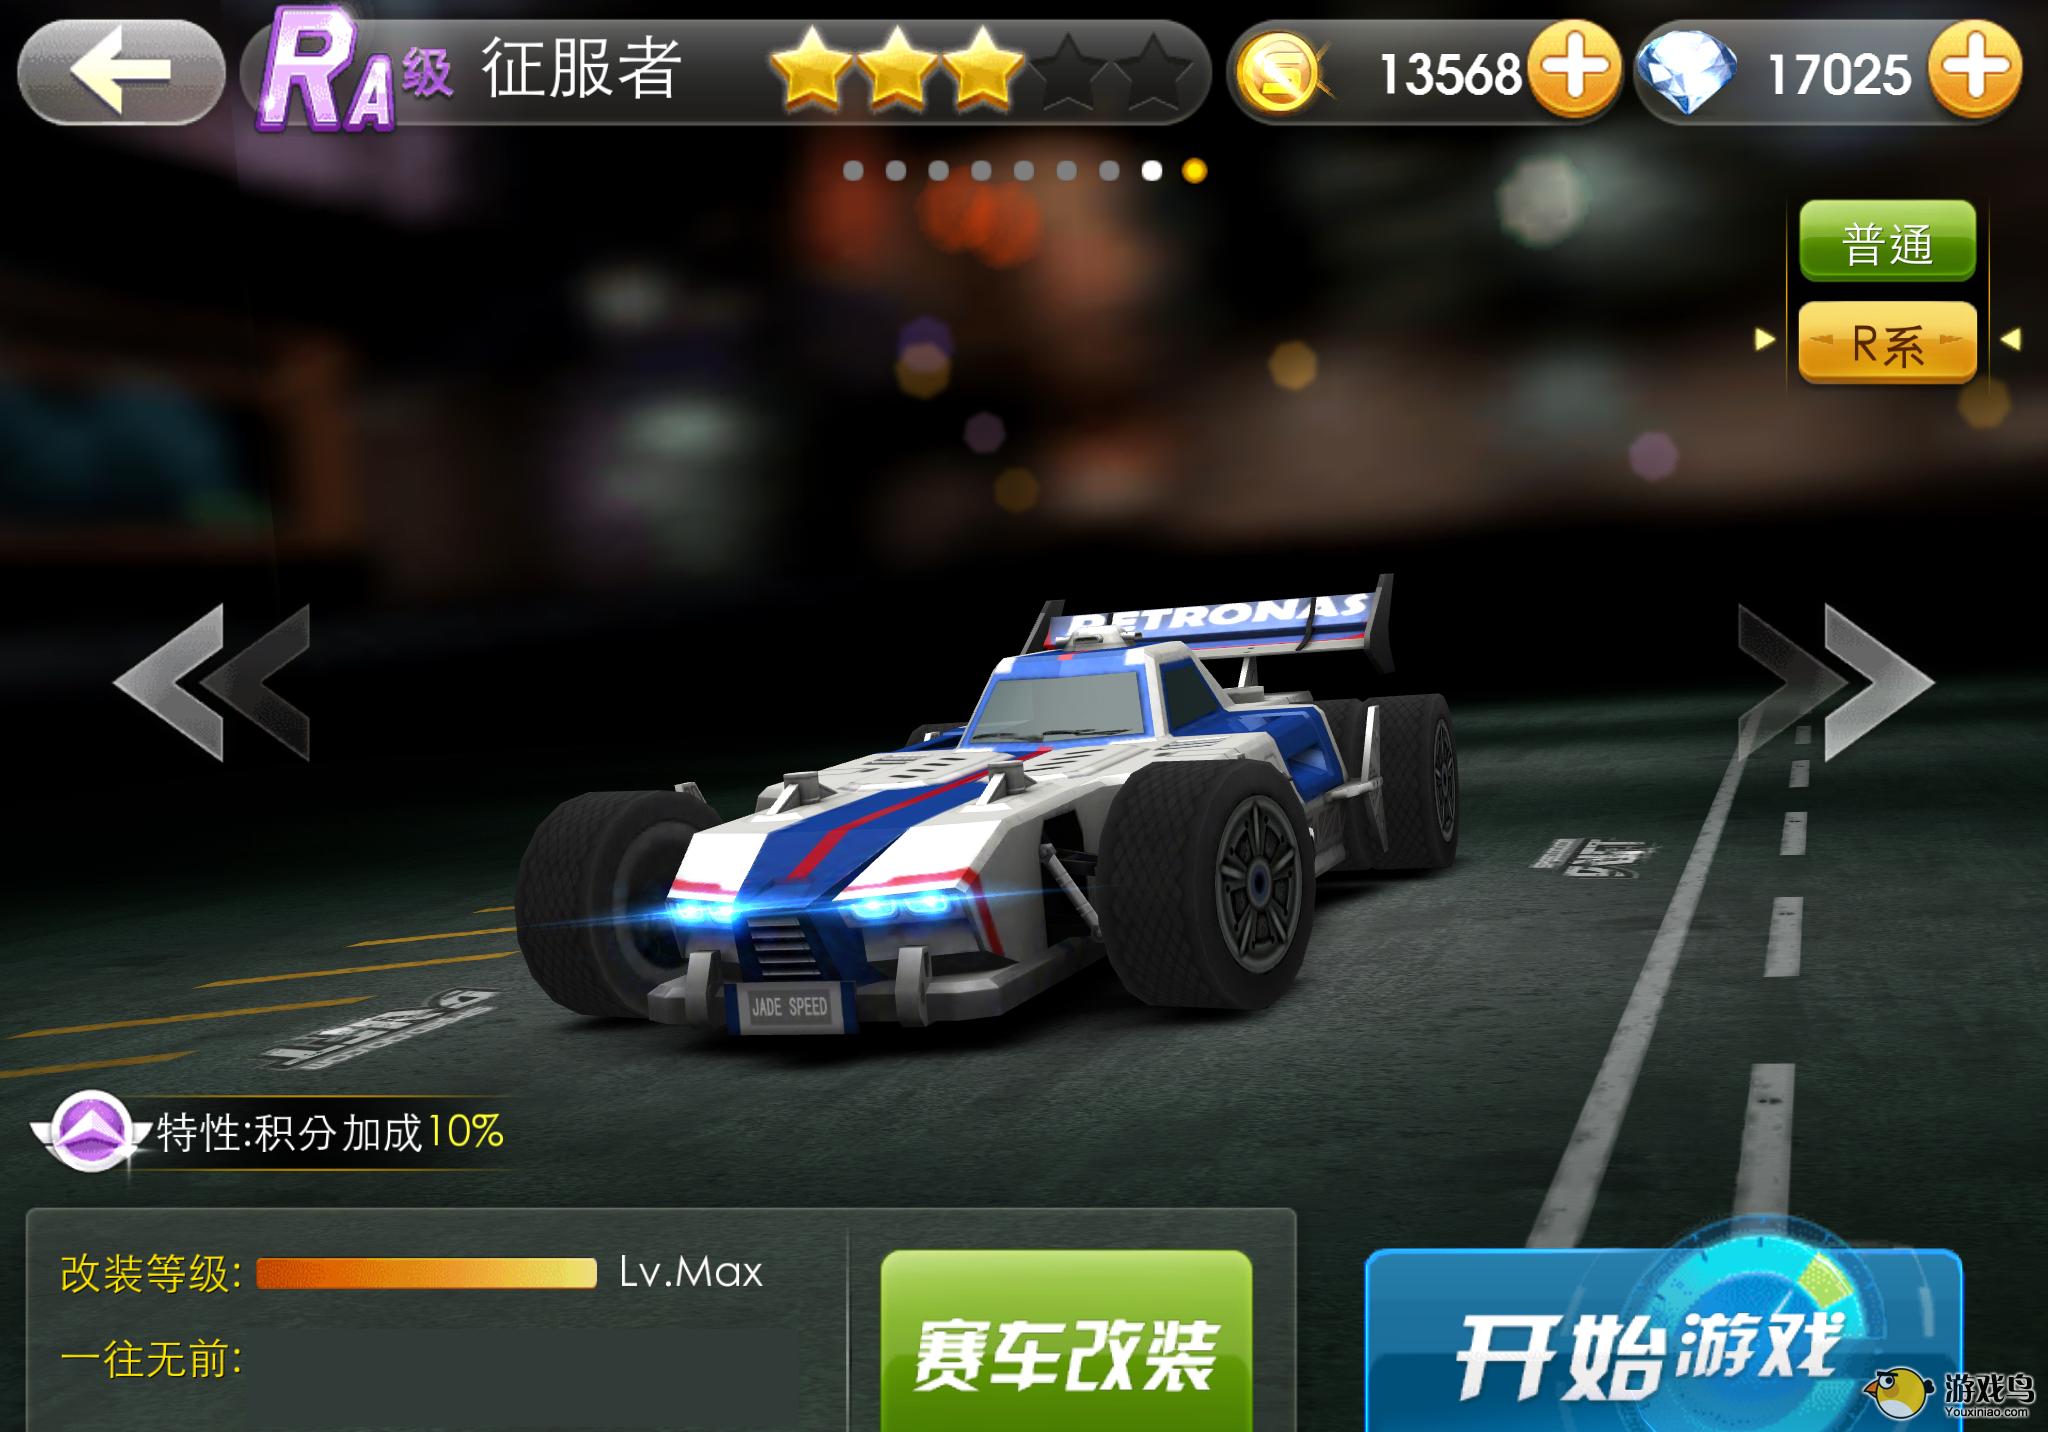 RA级征服者 赛车性能介绍[图]图片1